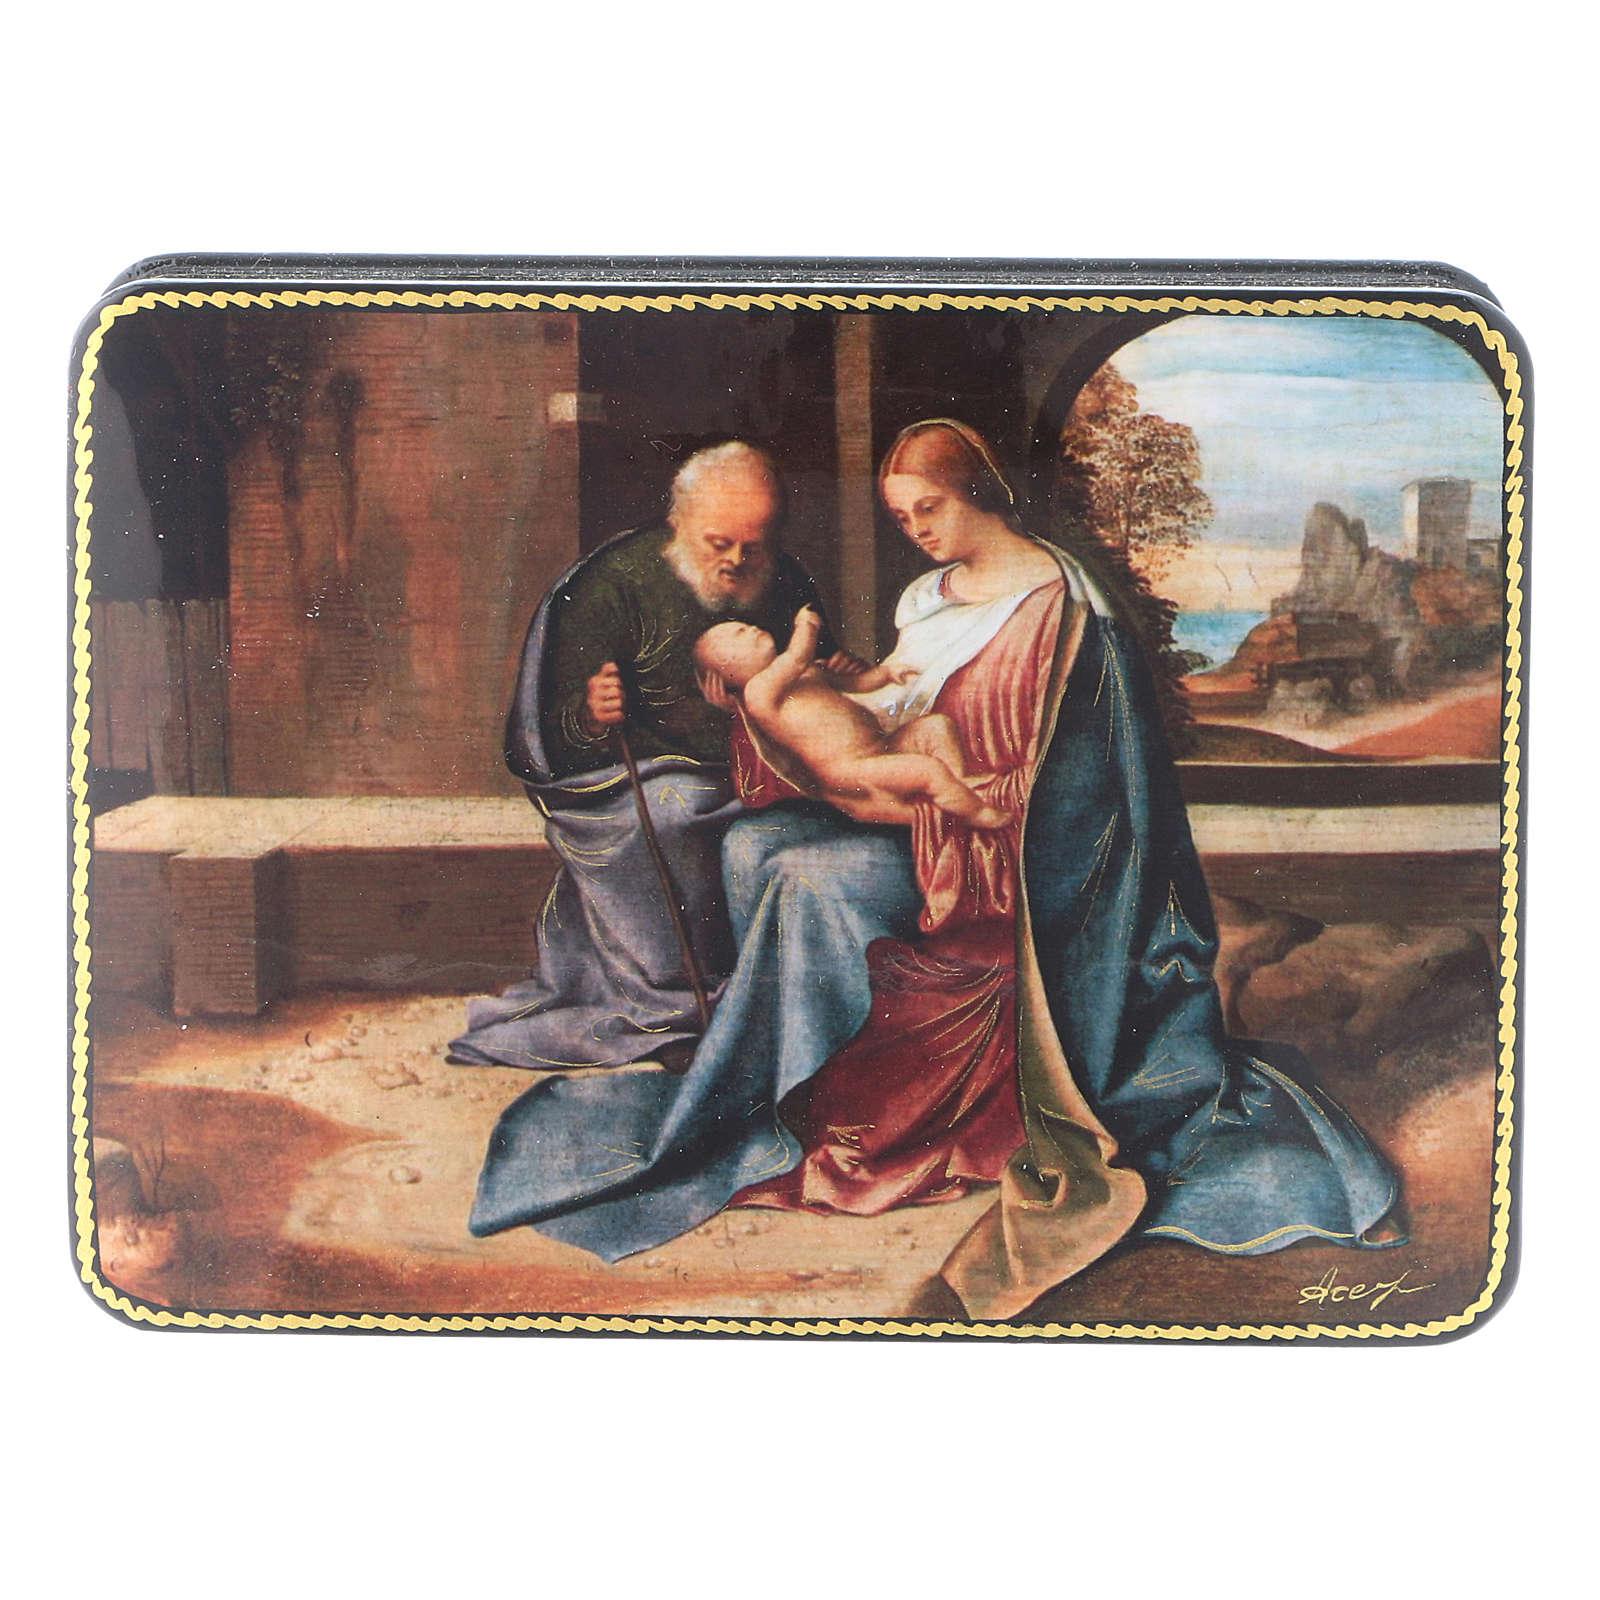 Scatola russa cartapesta Nascita Gesù rinascimentale Fedoskino style 15x11 4